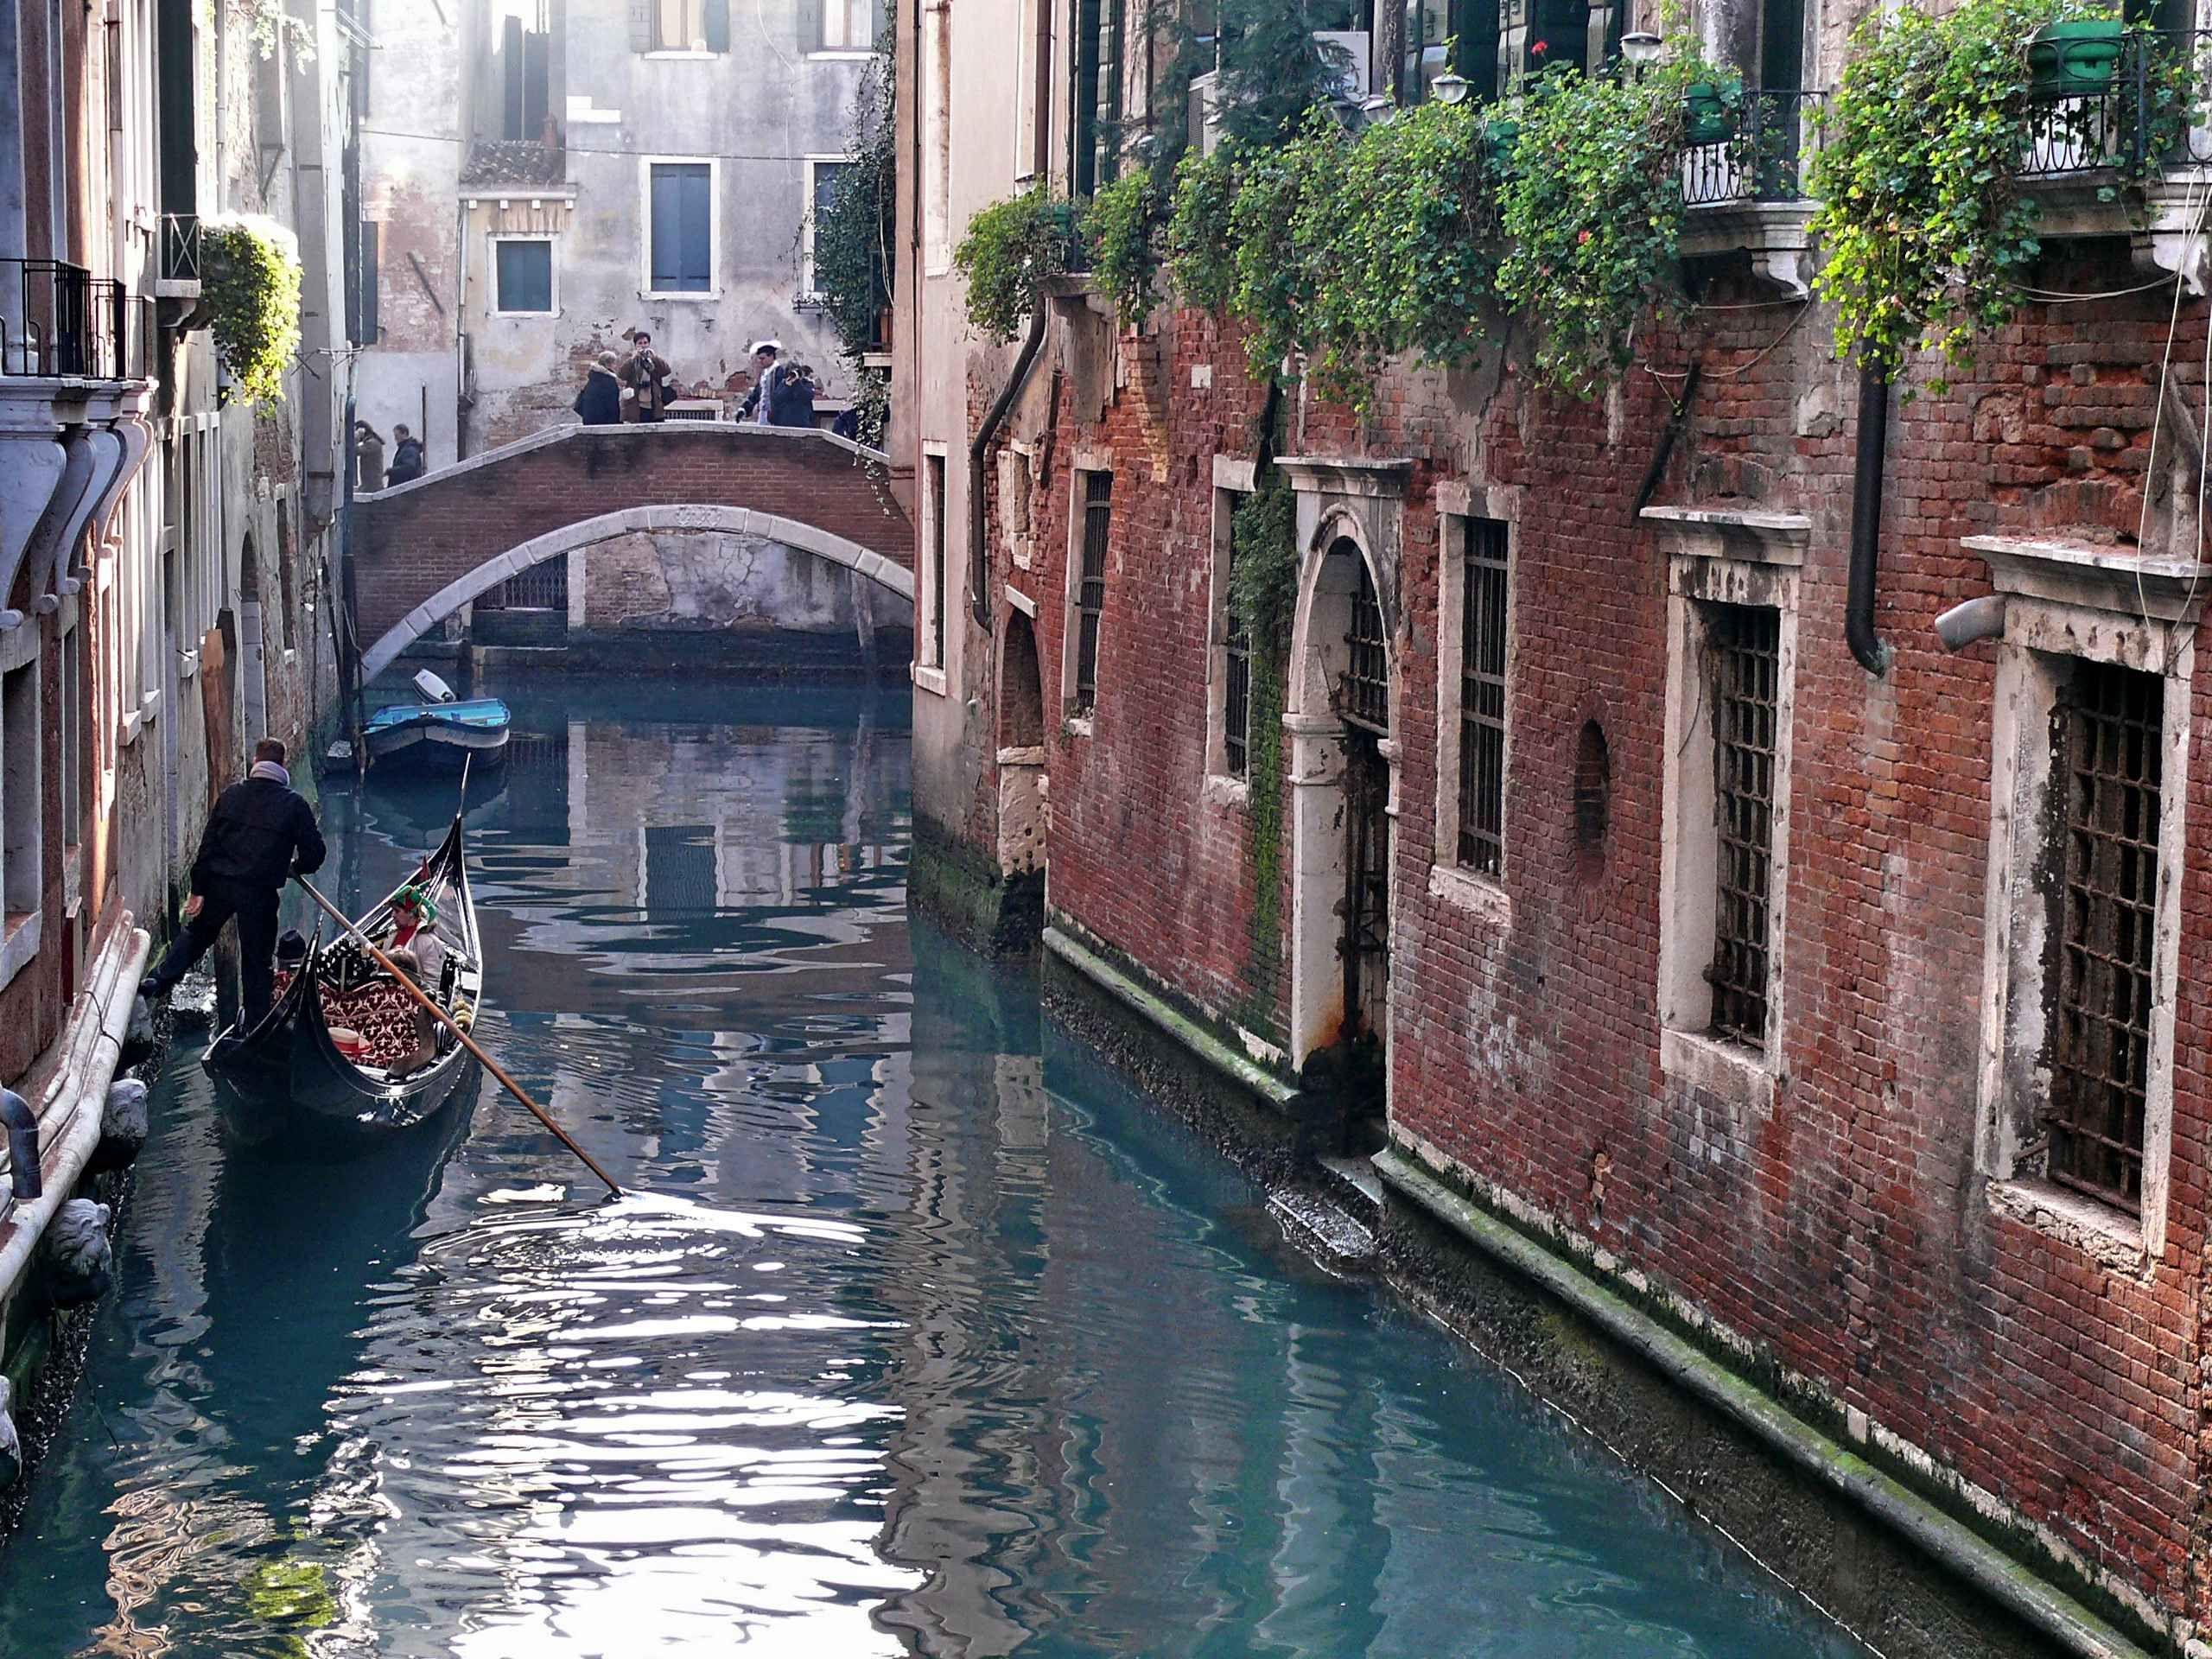 venezia-ritorno-al-passato.jpg (JPEG obrázek, 2560×1920 bodů) - Měřítko (47%)